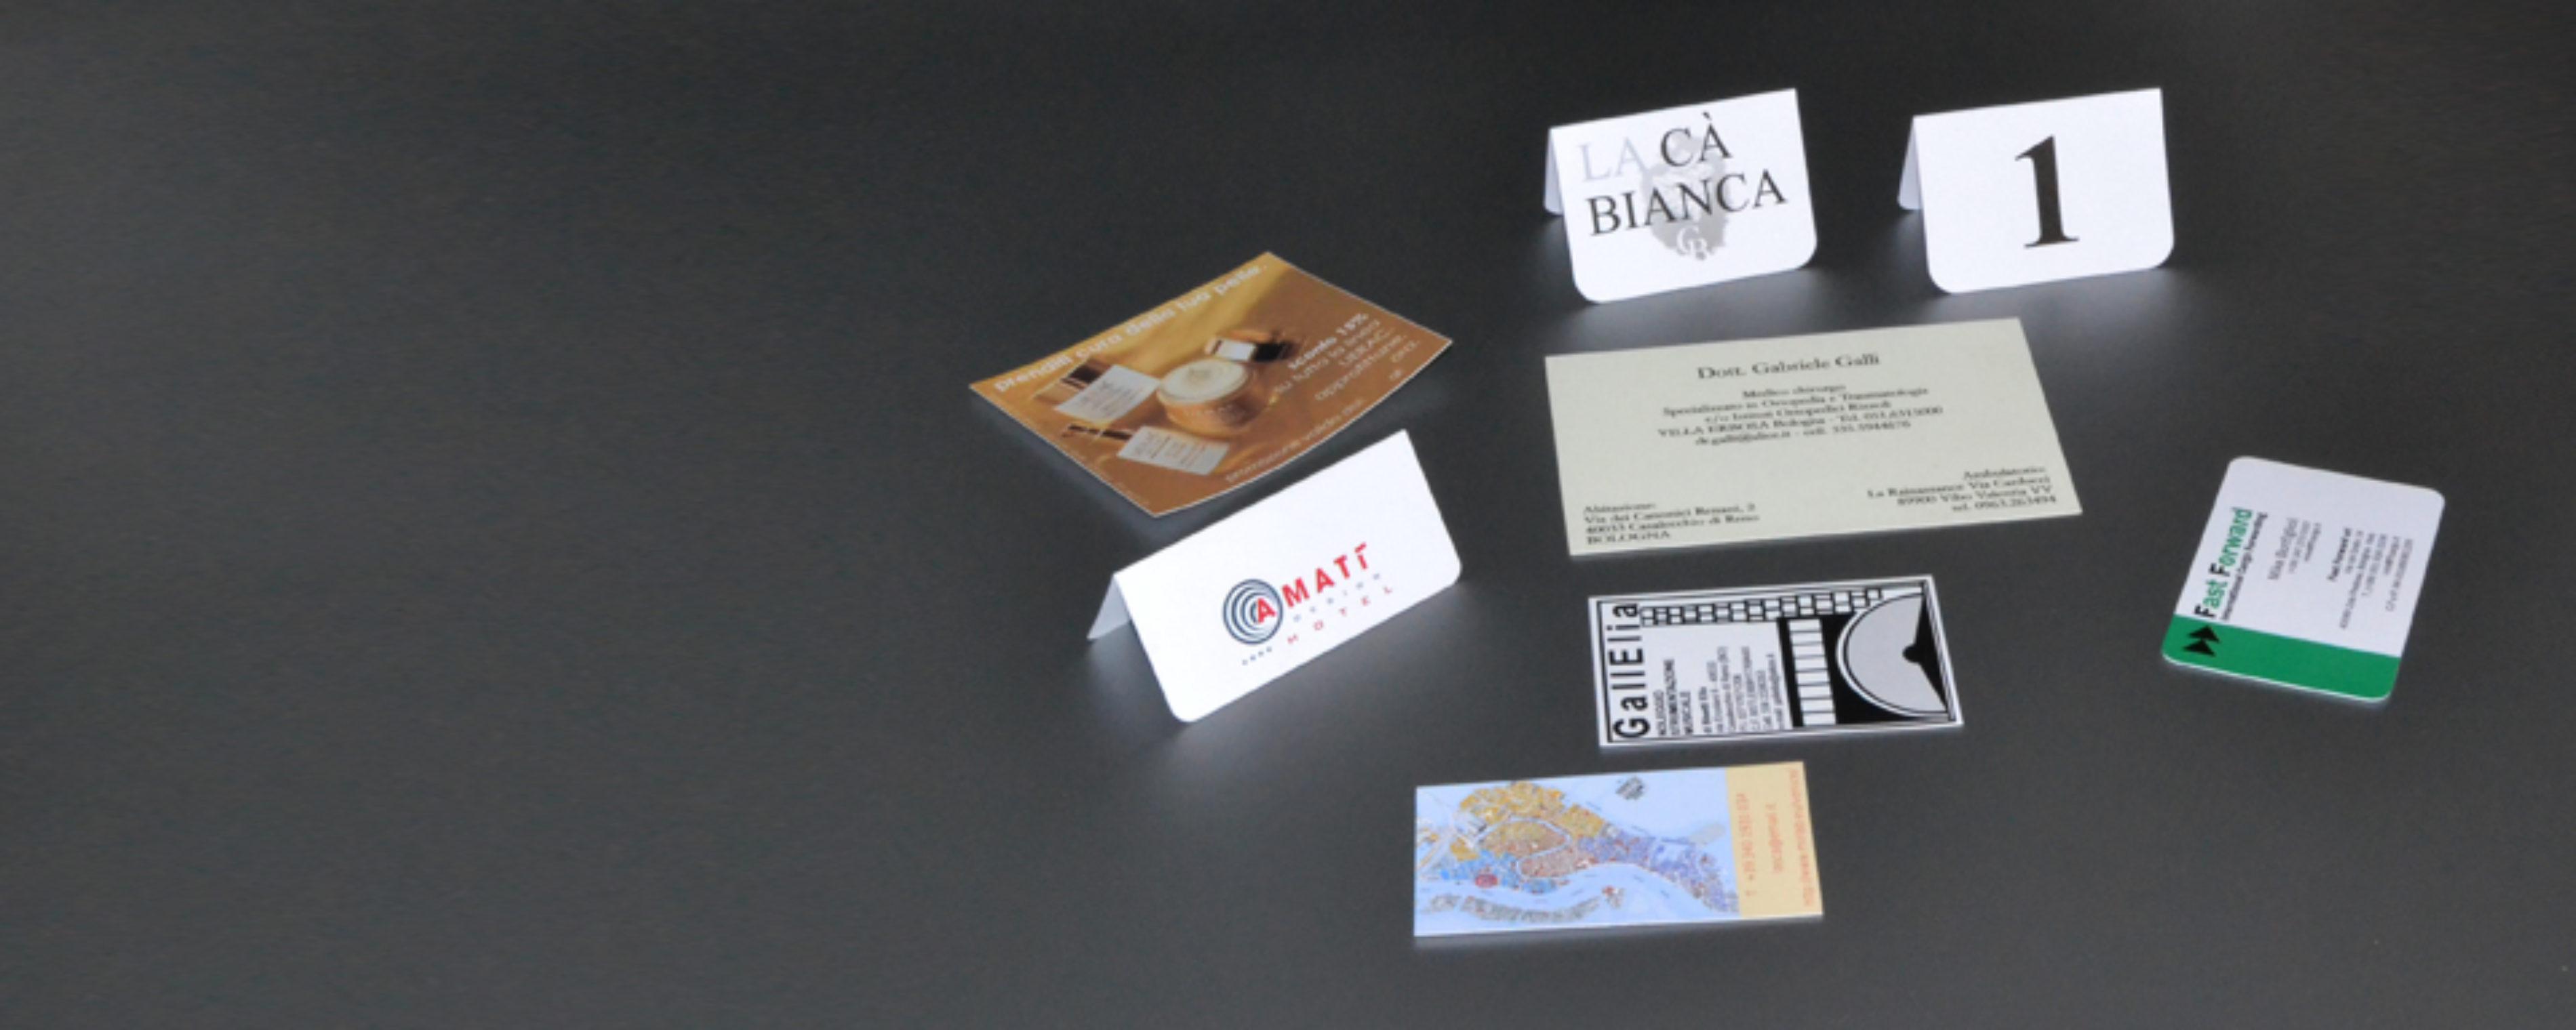 biglietti_in_cartaplastica